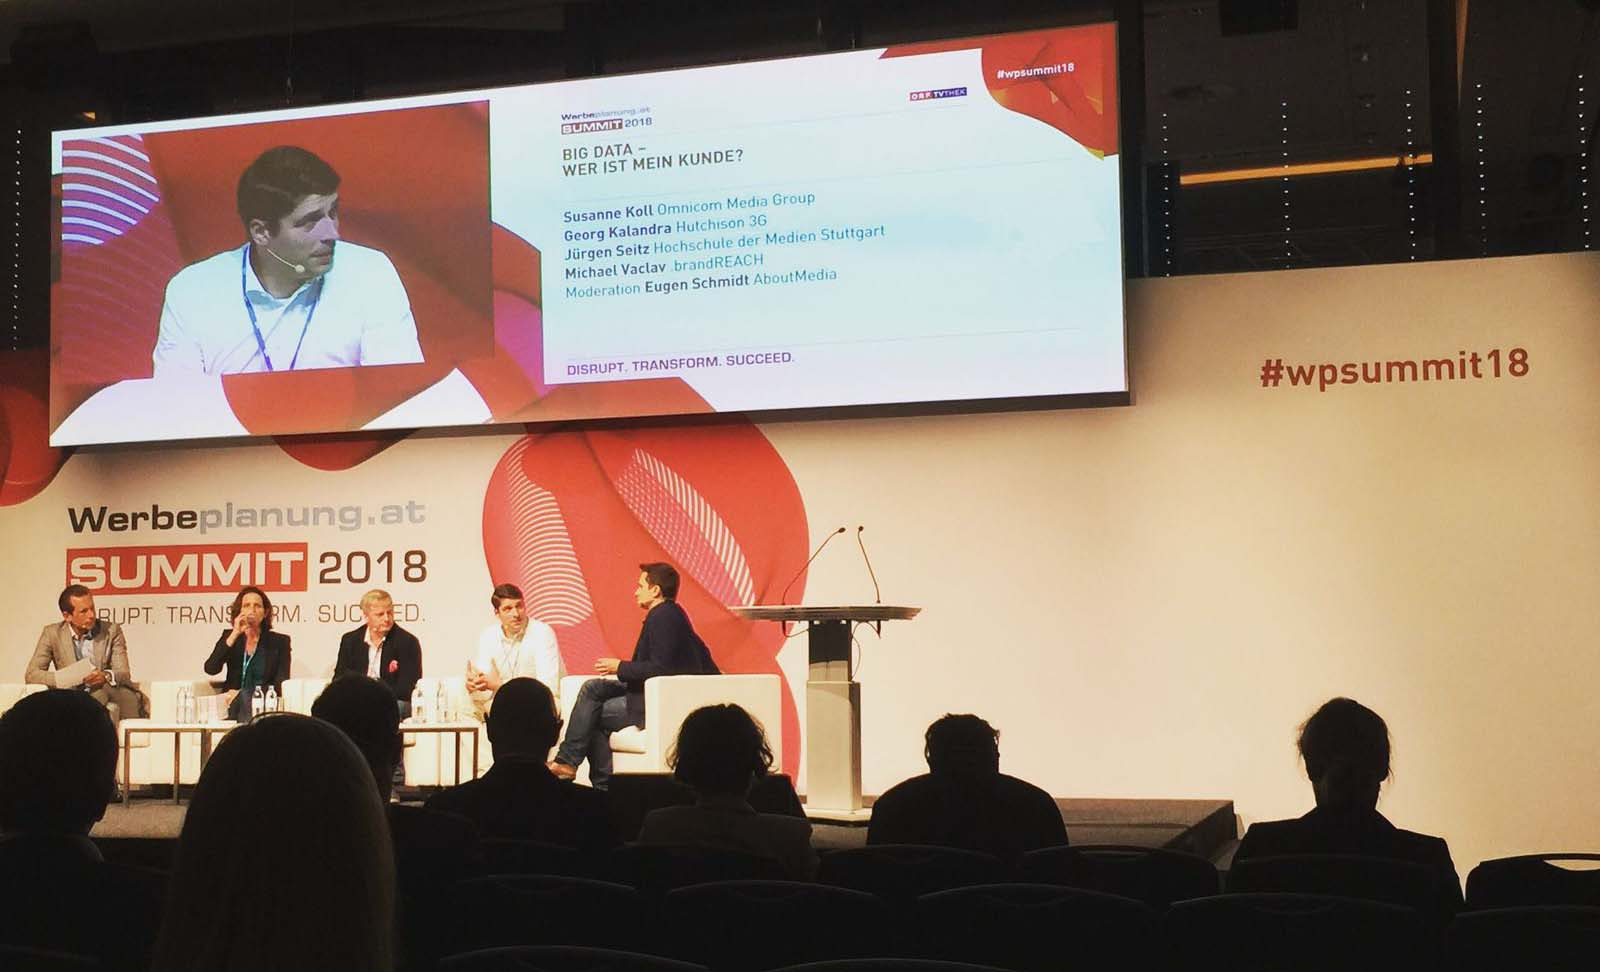 big-data-werbeplanung-summit-2018